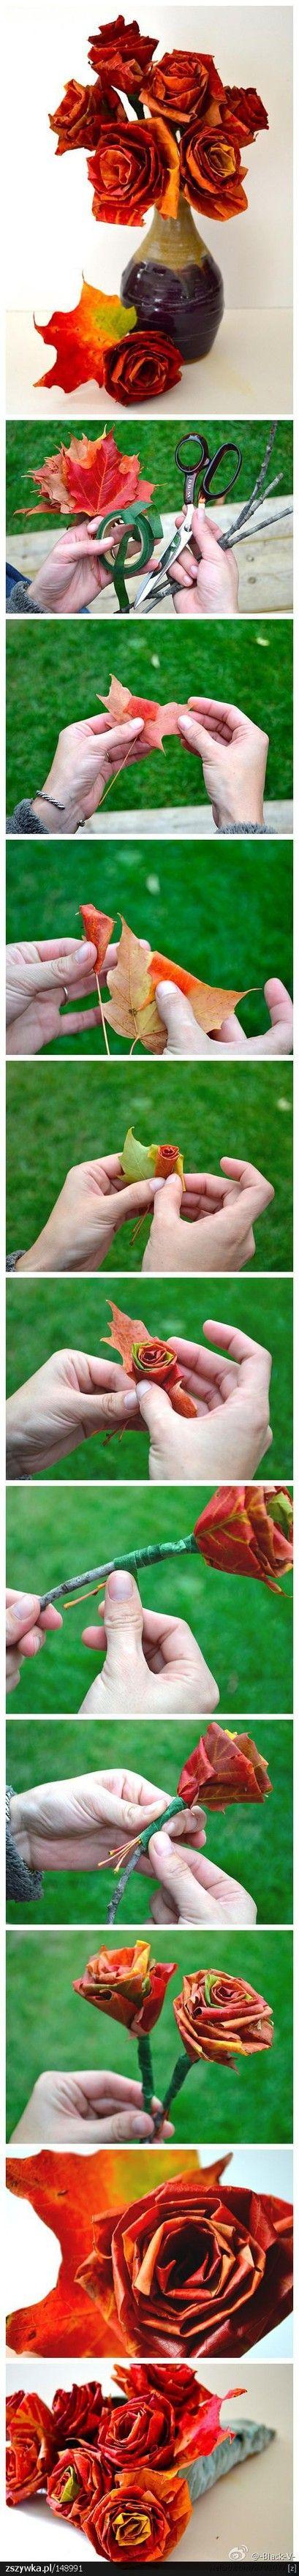 leaf roases-DIY